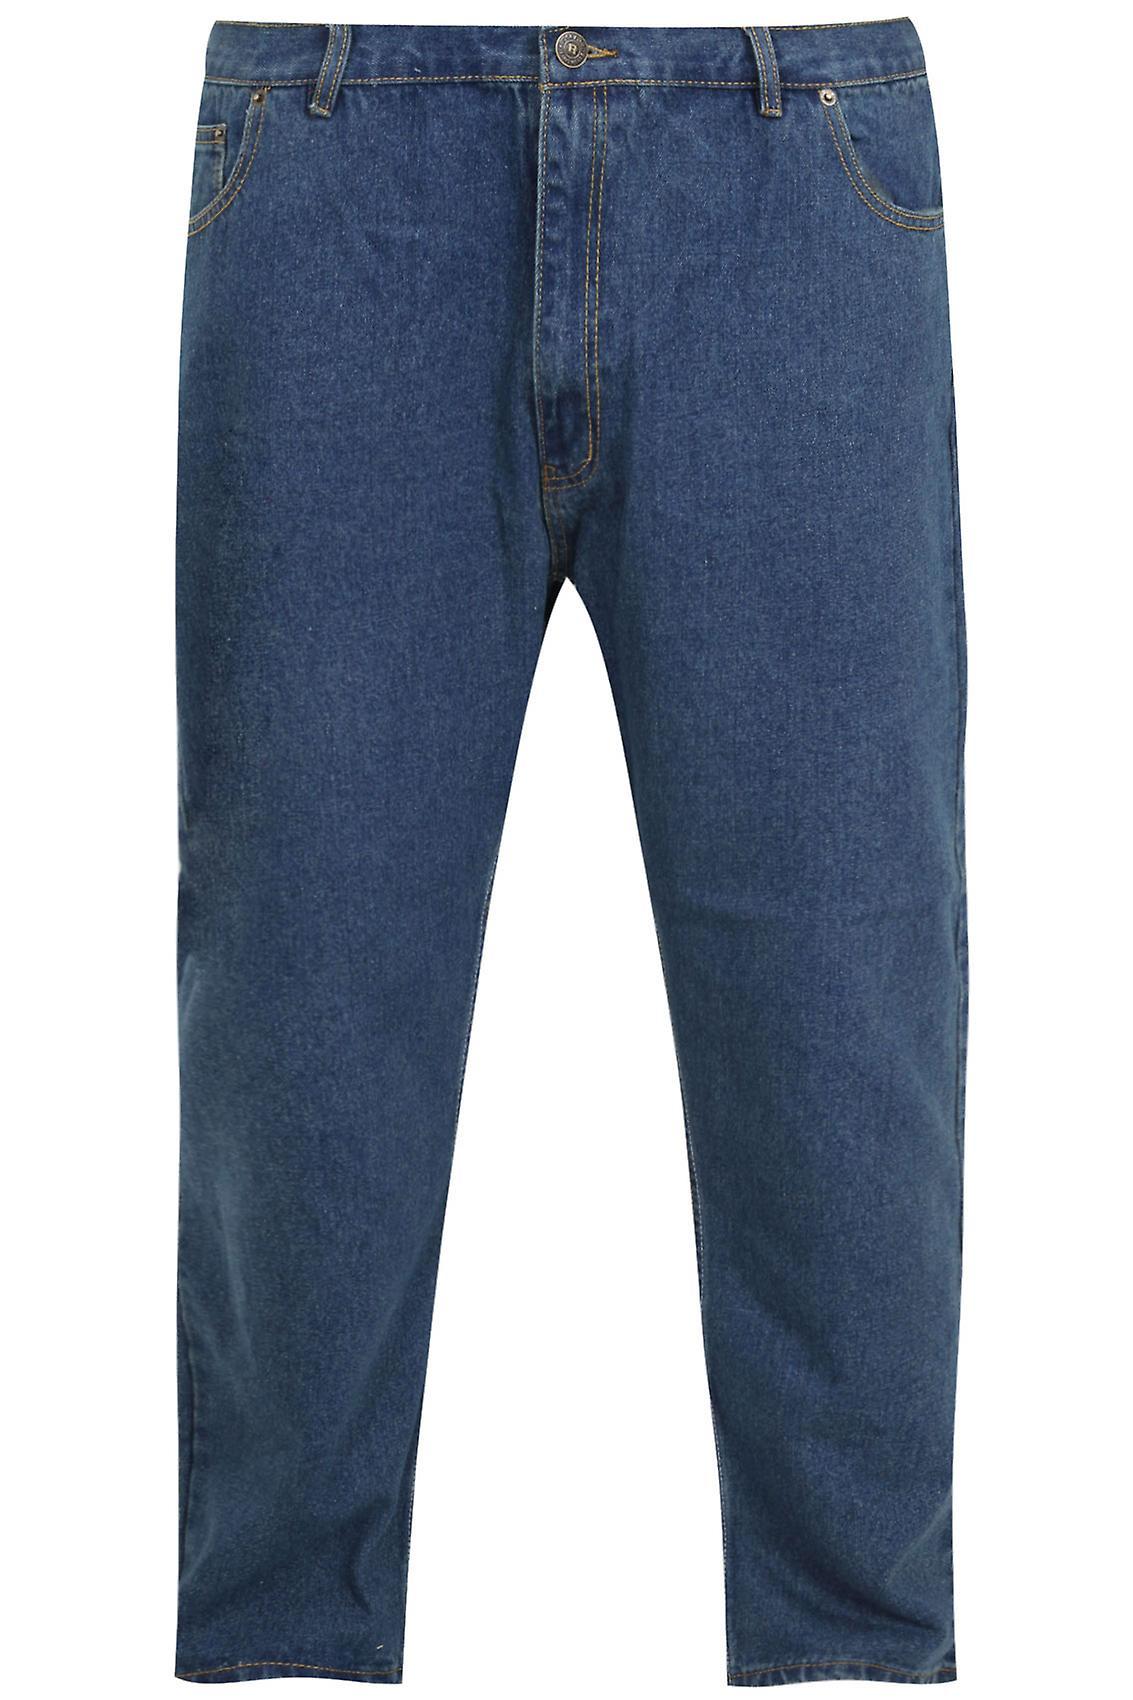 Rockford Stonewash Comfort Fit Jeans